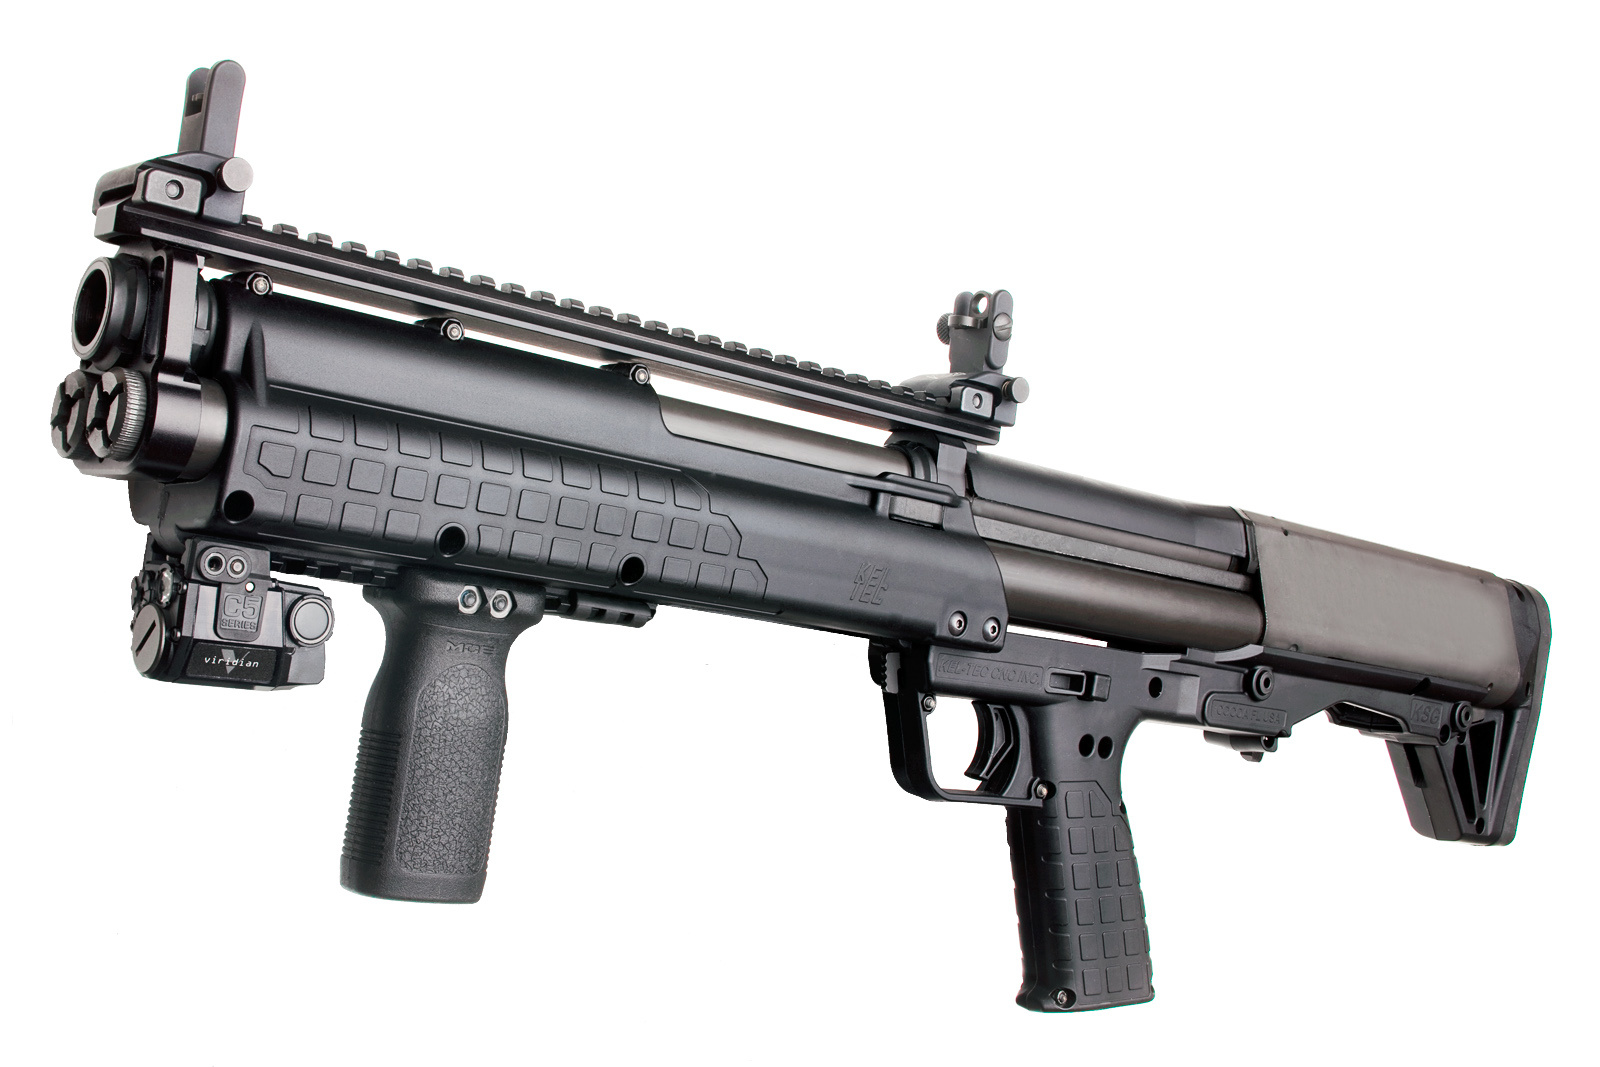 .45 acp vs. 9mm one more time-kel-tec_ksg_shotgun_oleg_volk_1.jpg